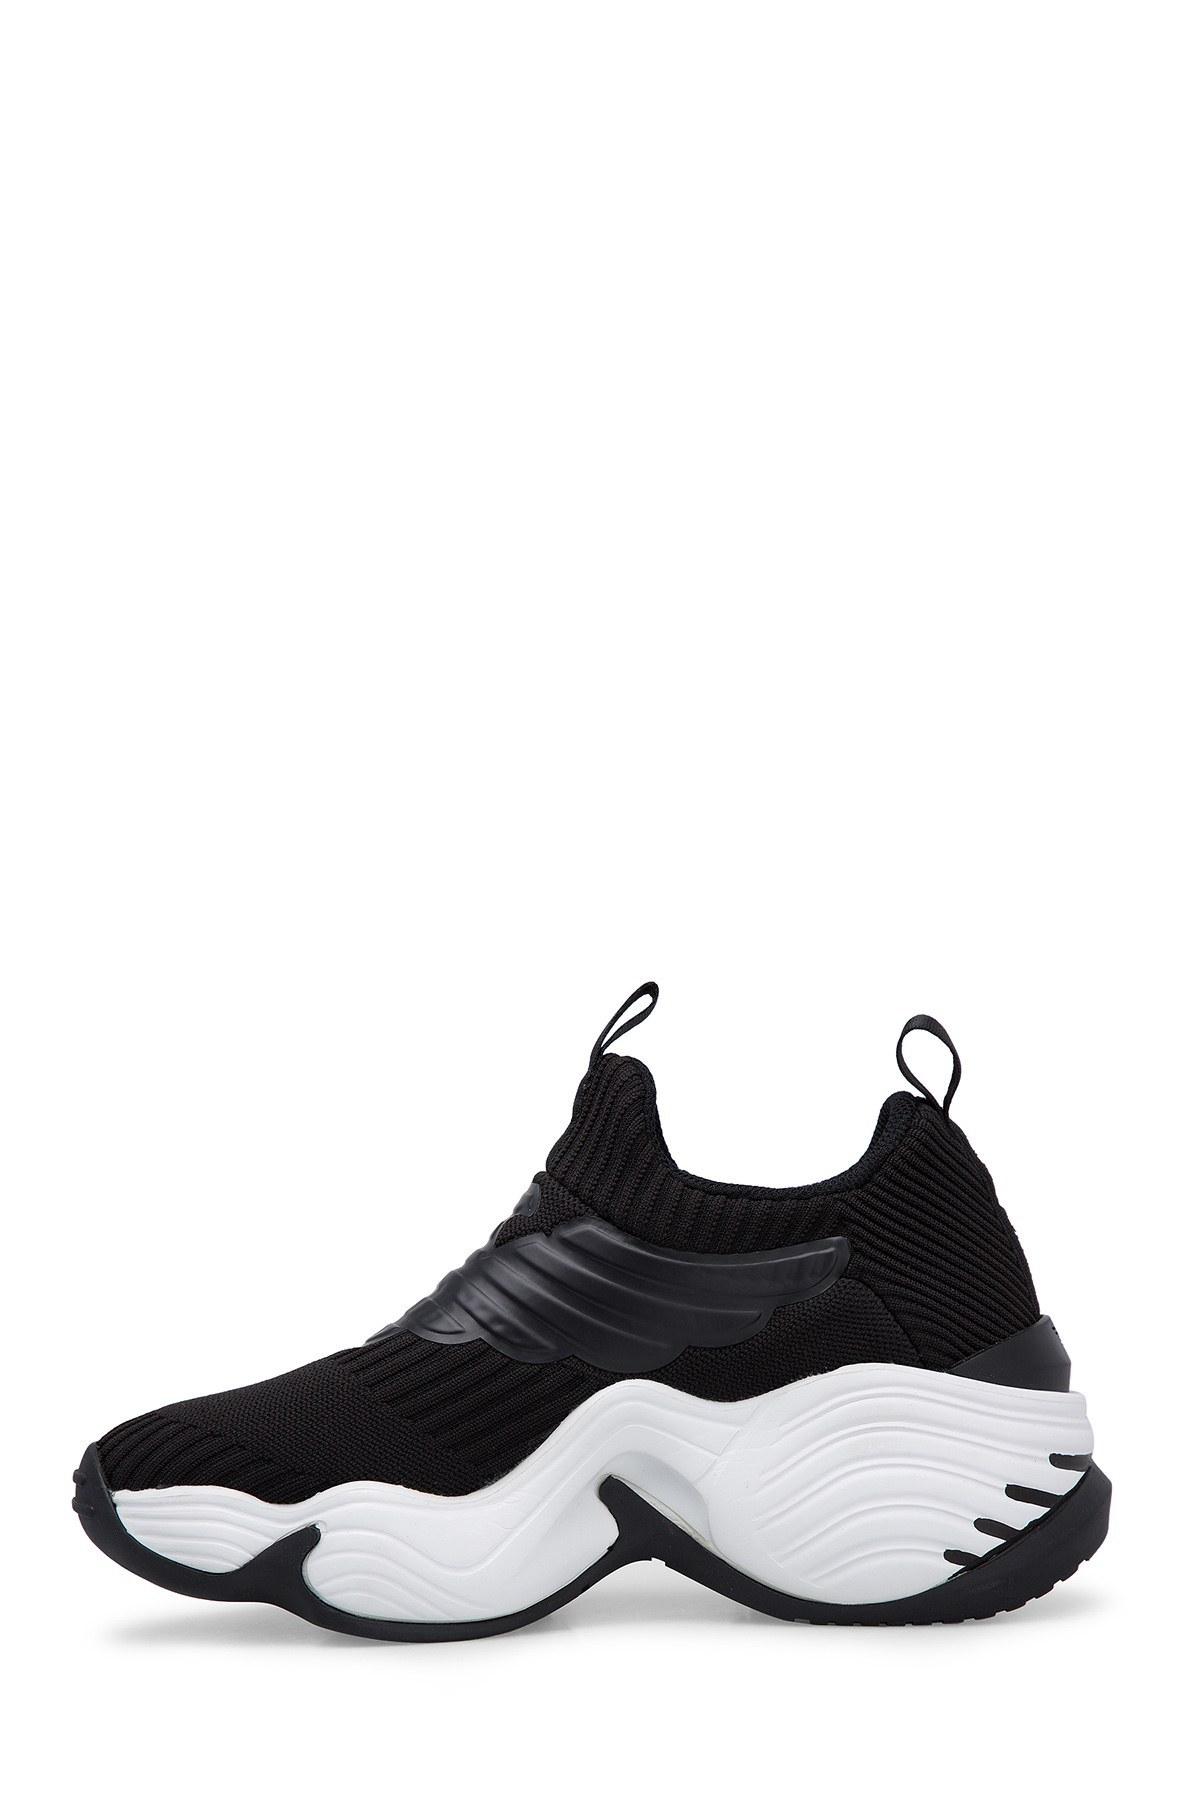 Emporio Armani Kadın Ayakkabı S X3X092 XM079 K001 SİYAH